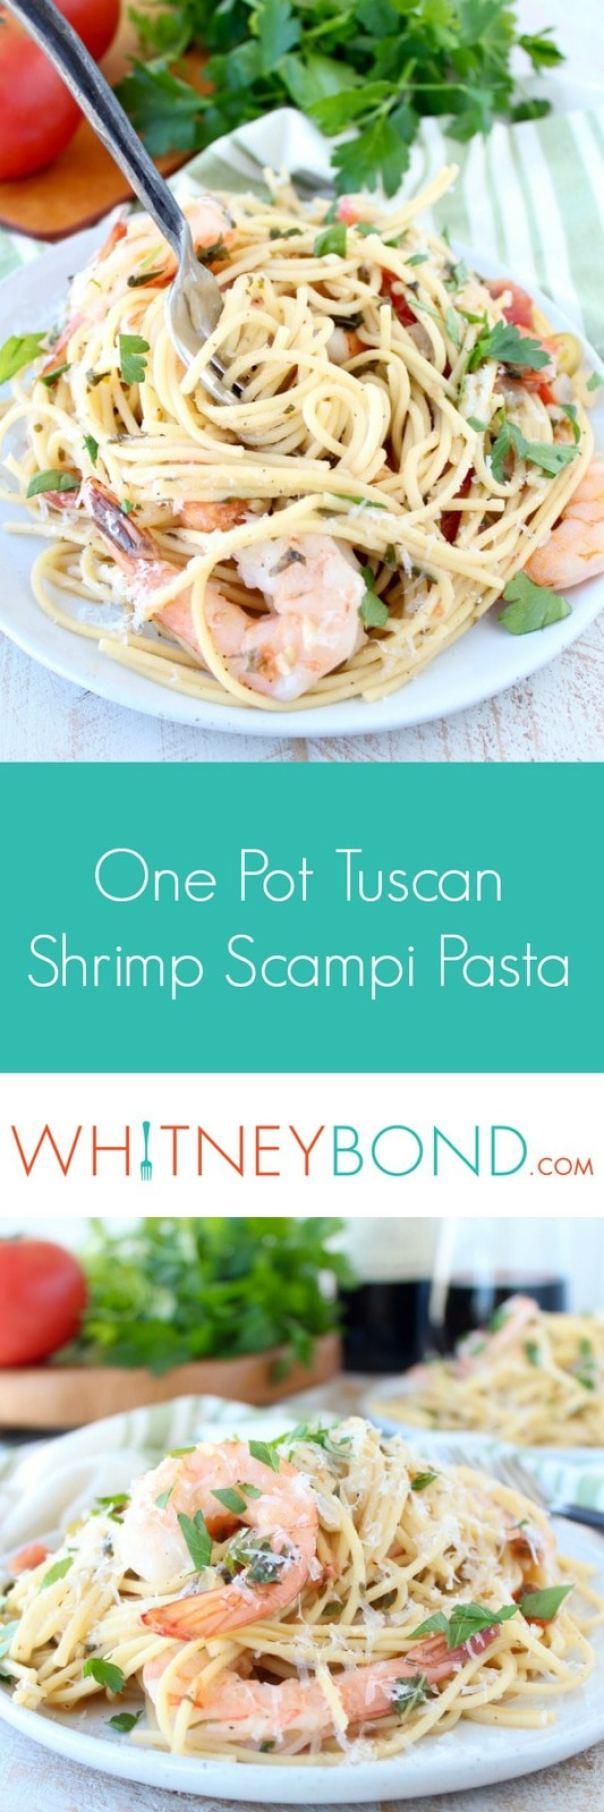 One Pot Tuscan Shrimp Scampi Pasta